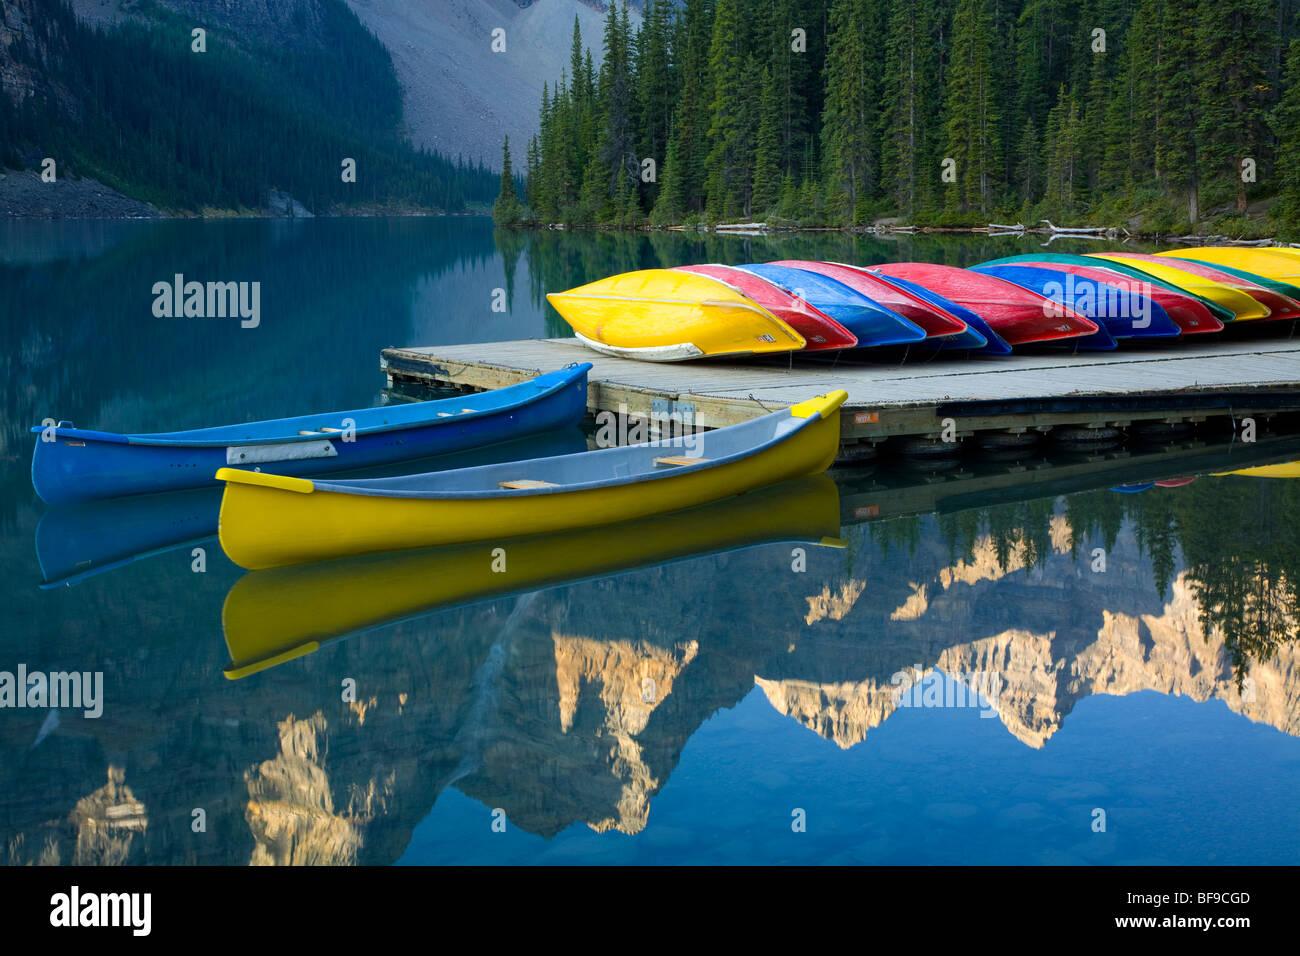 Canoes Moored on Moraine Lake, Banff National Park, UNESCO